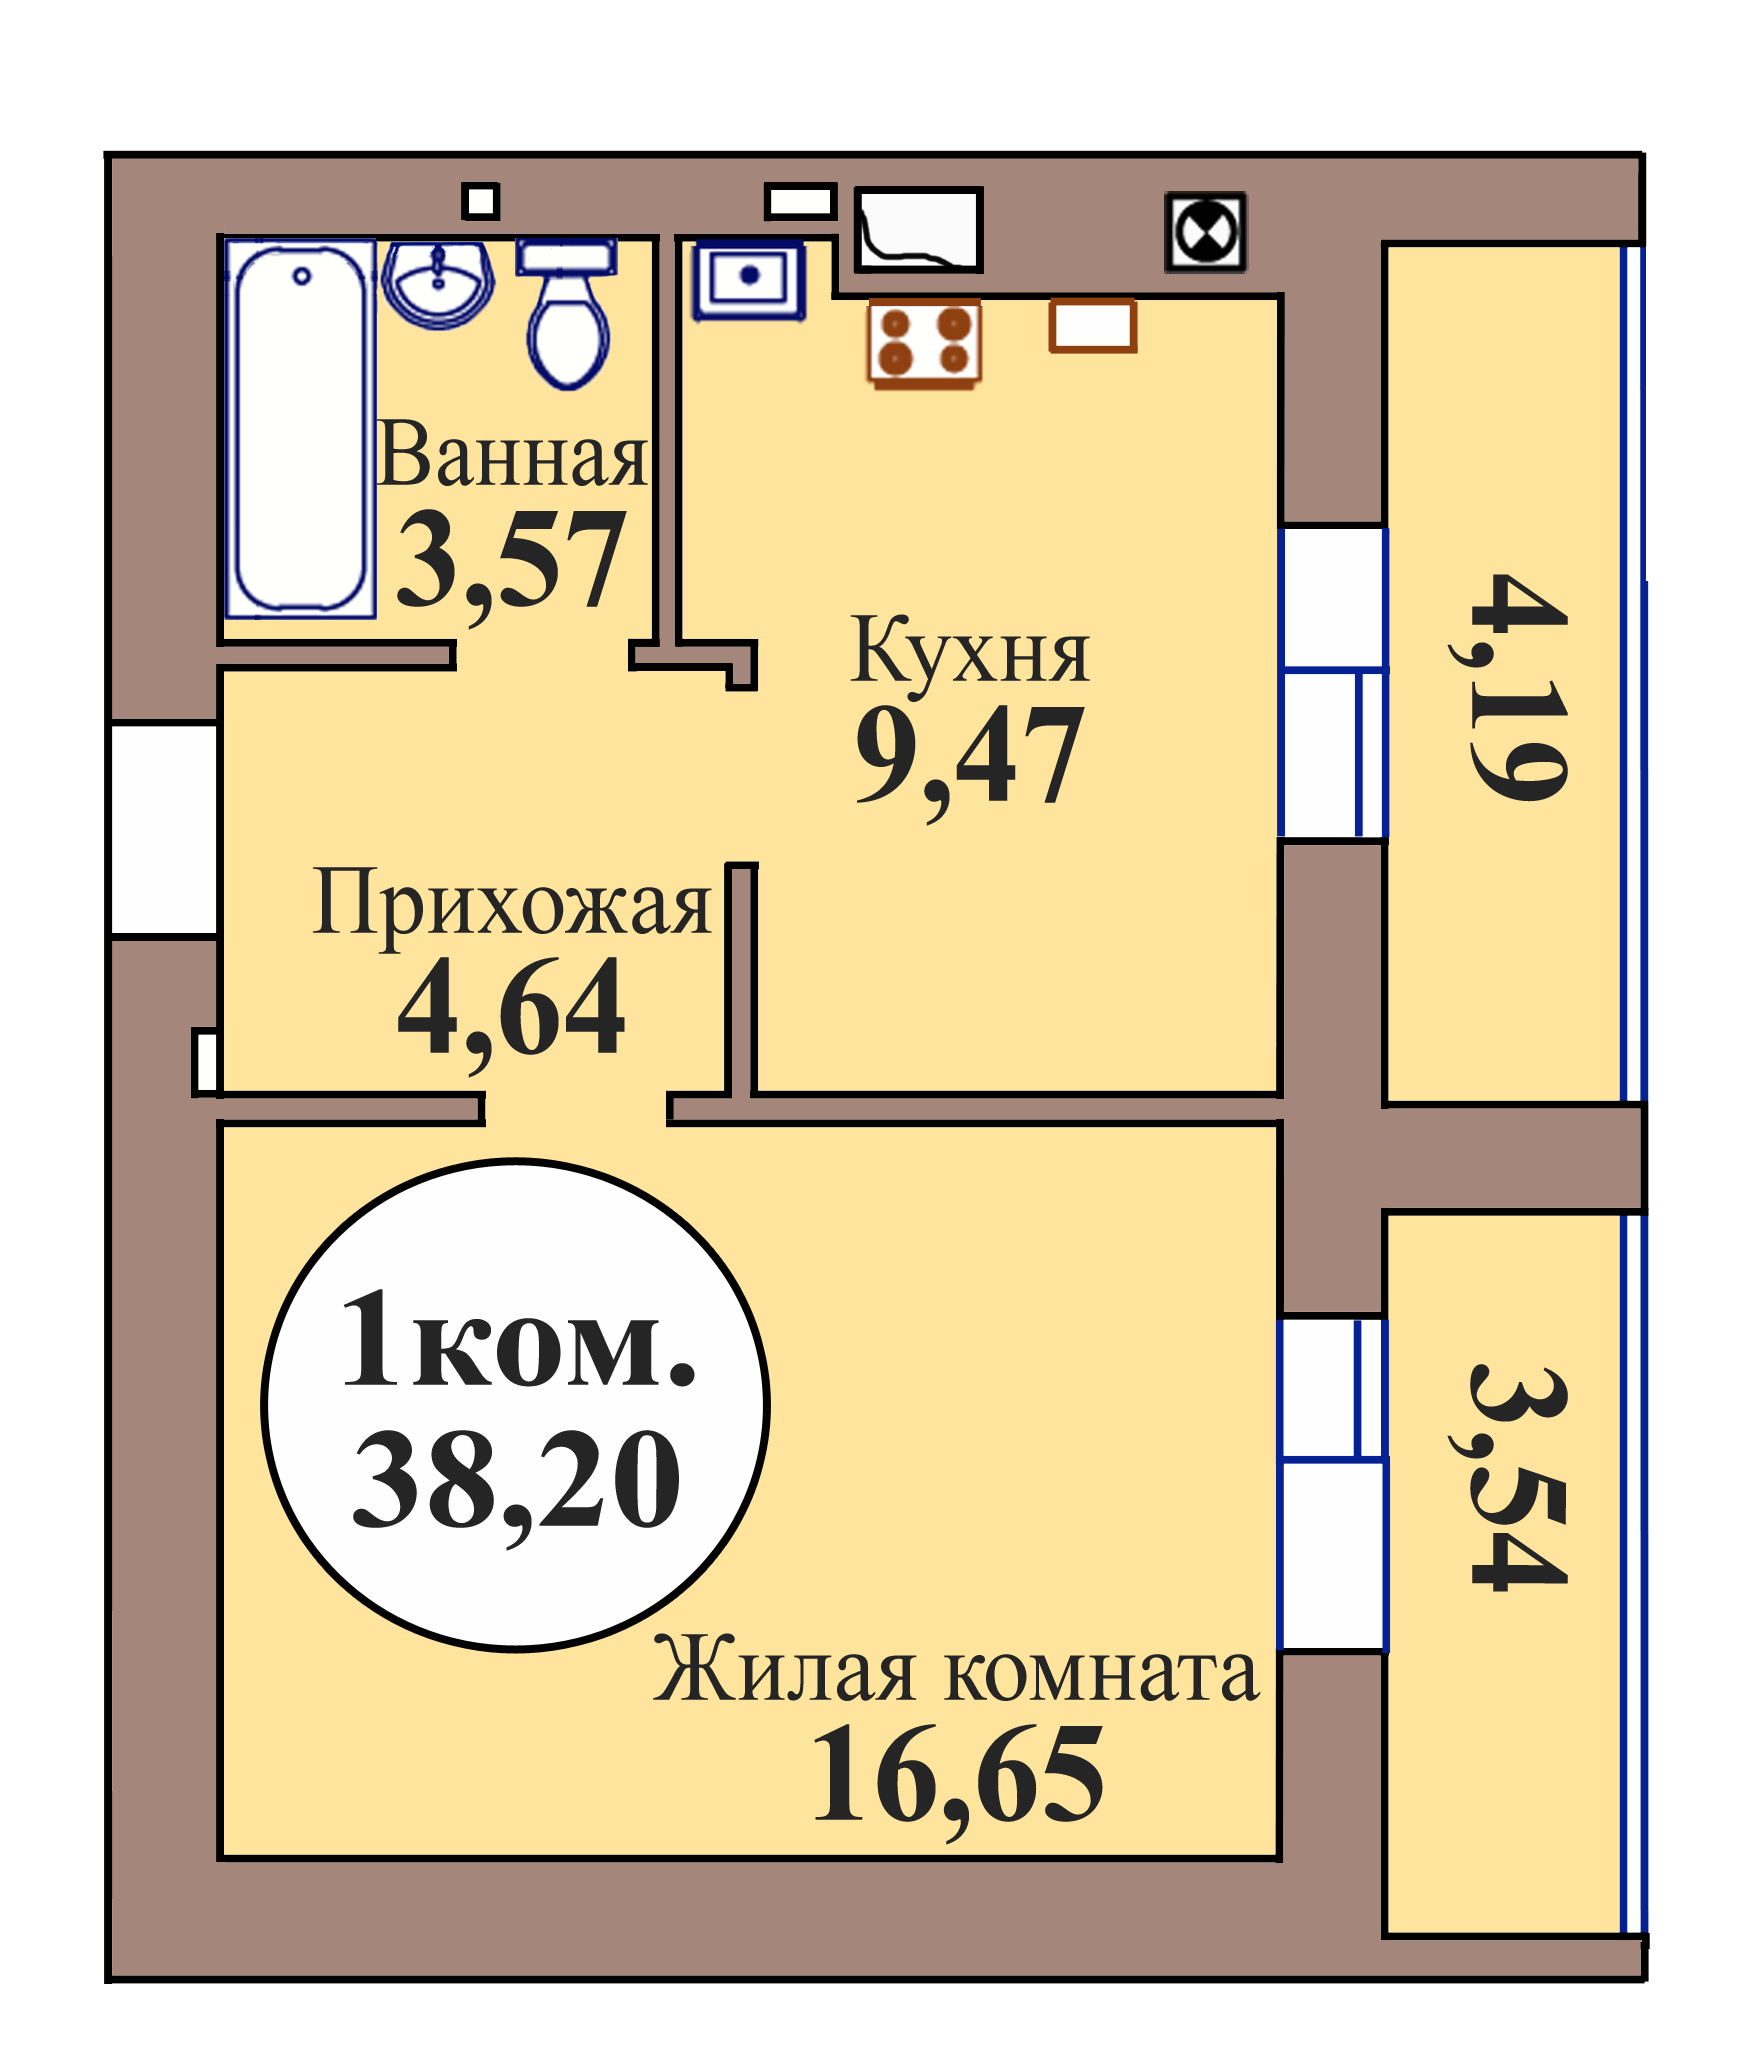 1-комн. кв. по пер. Калининградский, 5 кв. 25 в Калининграде